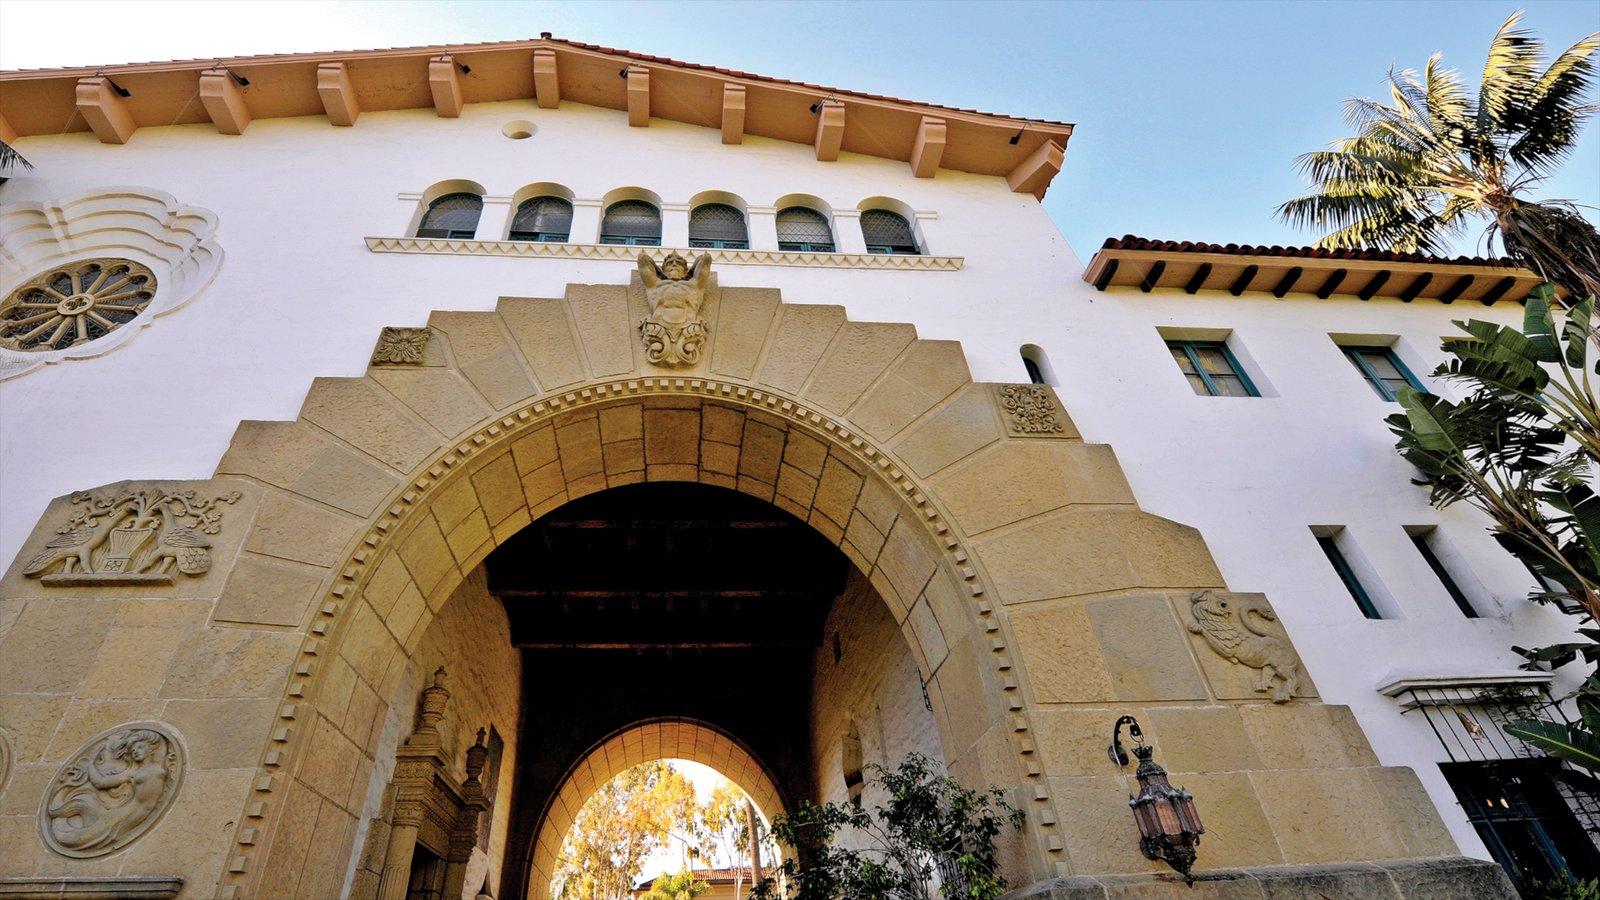 Santa Barbara caracterizando arquitetura de patrimônio